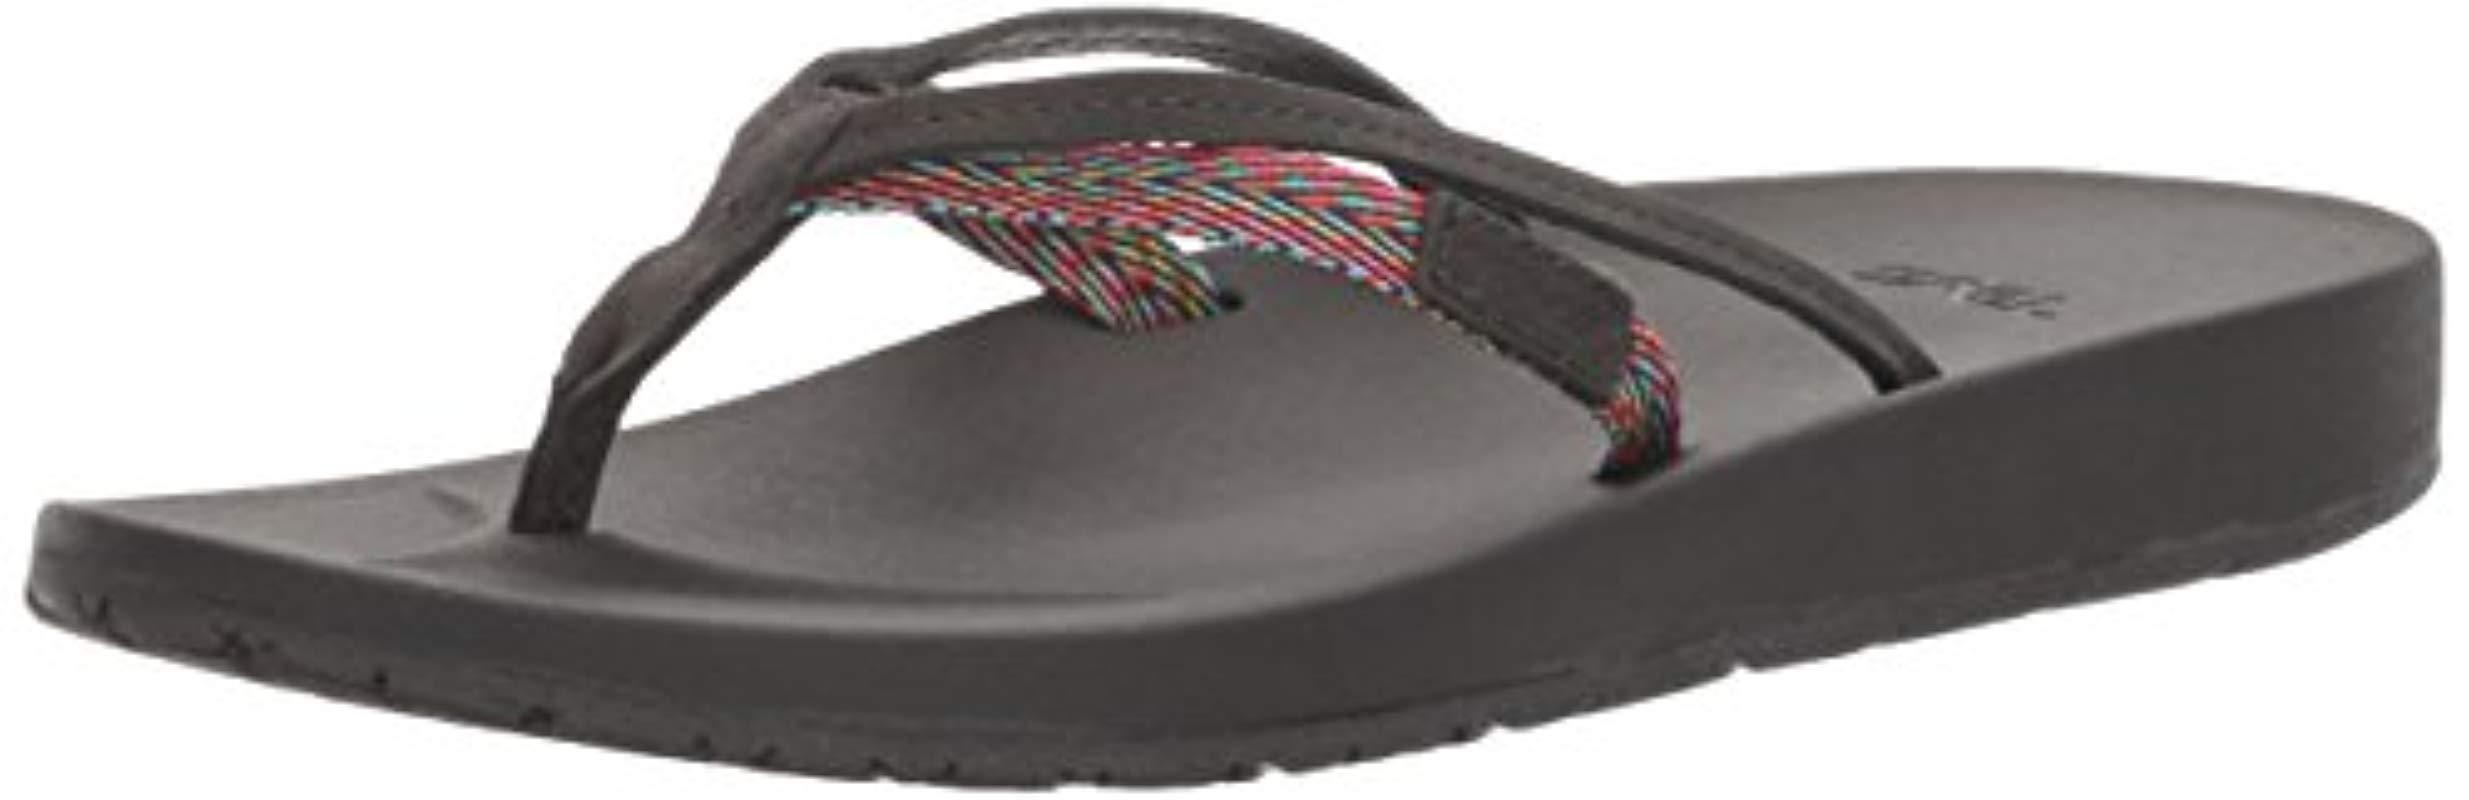 9f2fbd47305599 Lyst - Teva W Azure 2 Strap Sandal in Black